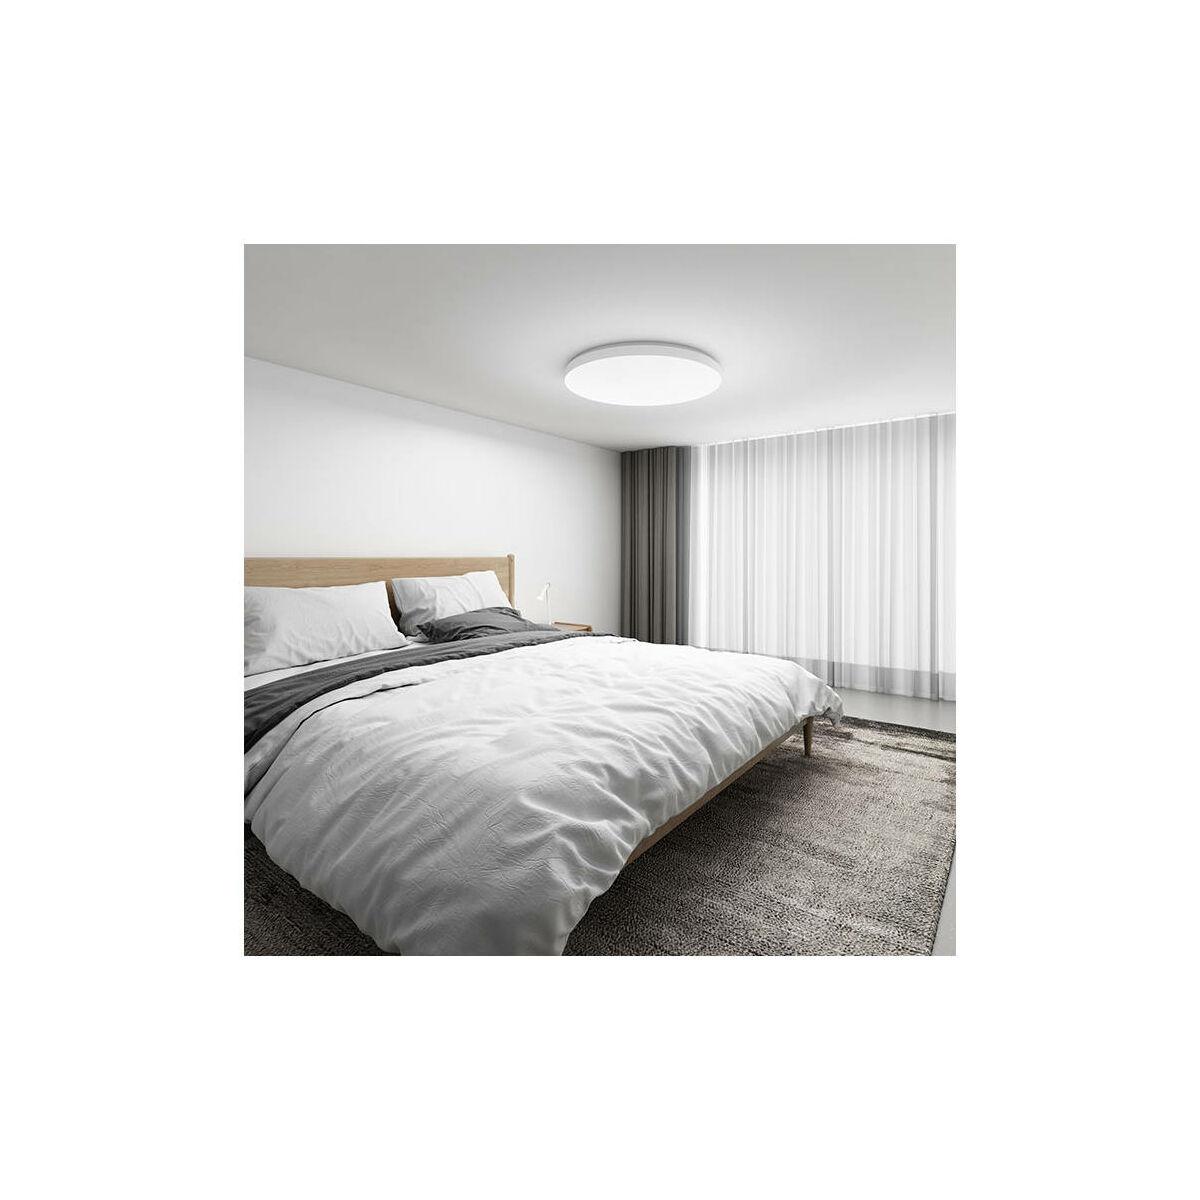 Xiaomi Mi LED Ceiling Light mennyezeti lámpa 3100 lm, 45W EU BHR4118GL